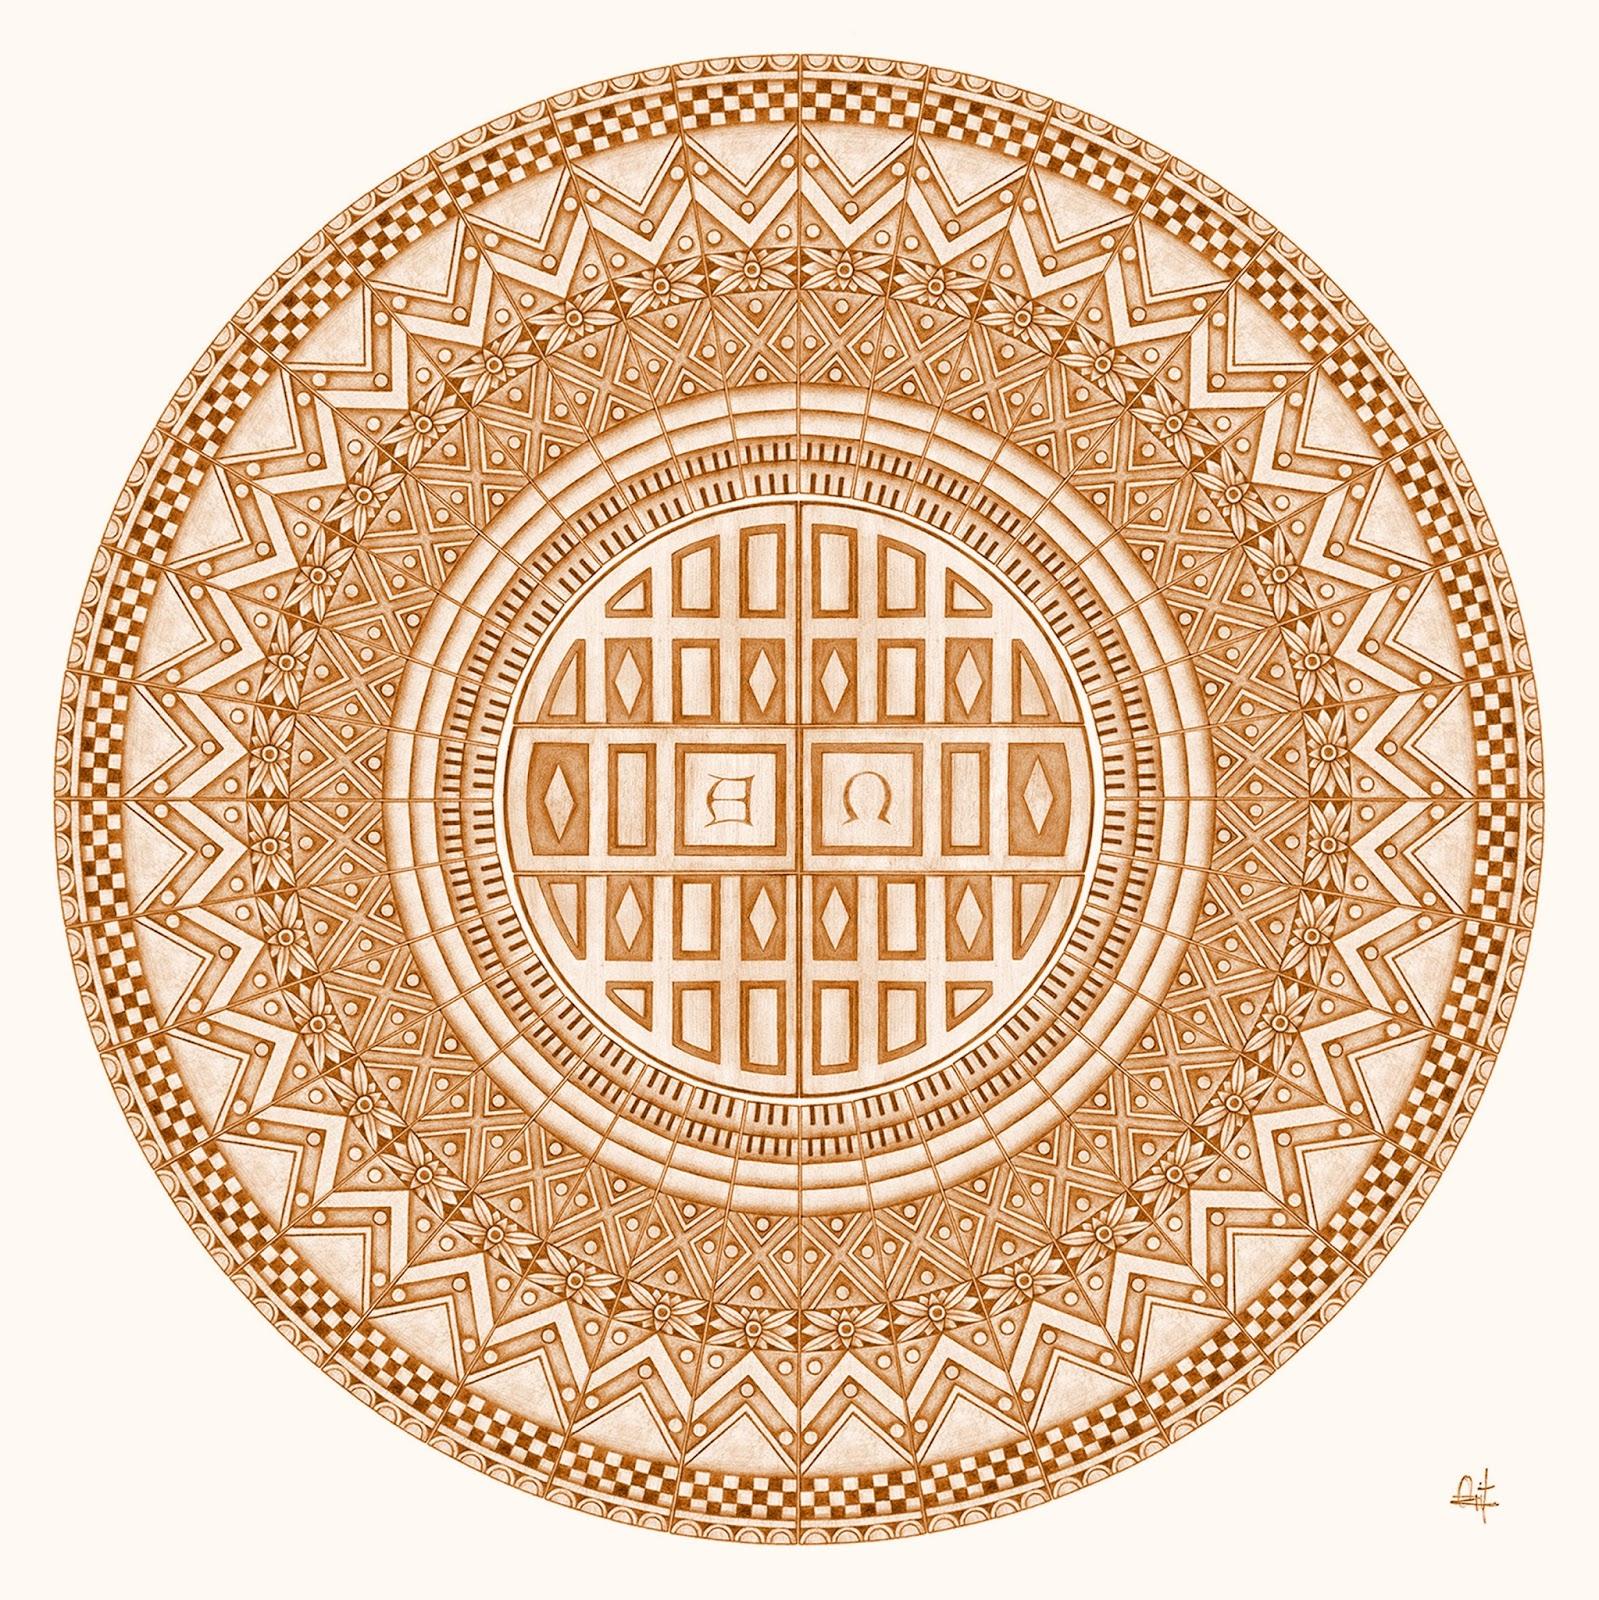 Arabesko Dibujo A Lápiz Mandala Diseño Estilo Románico Pencil